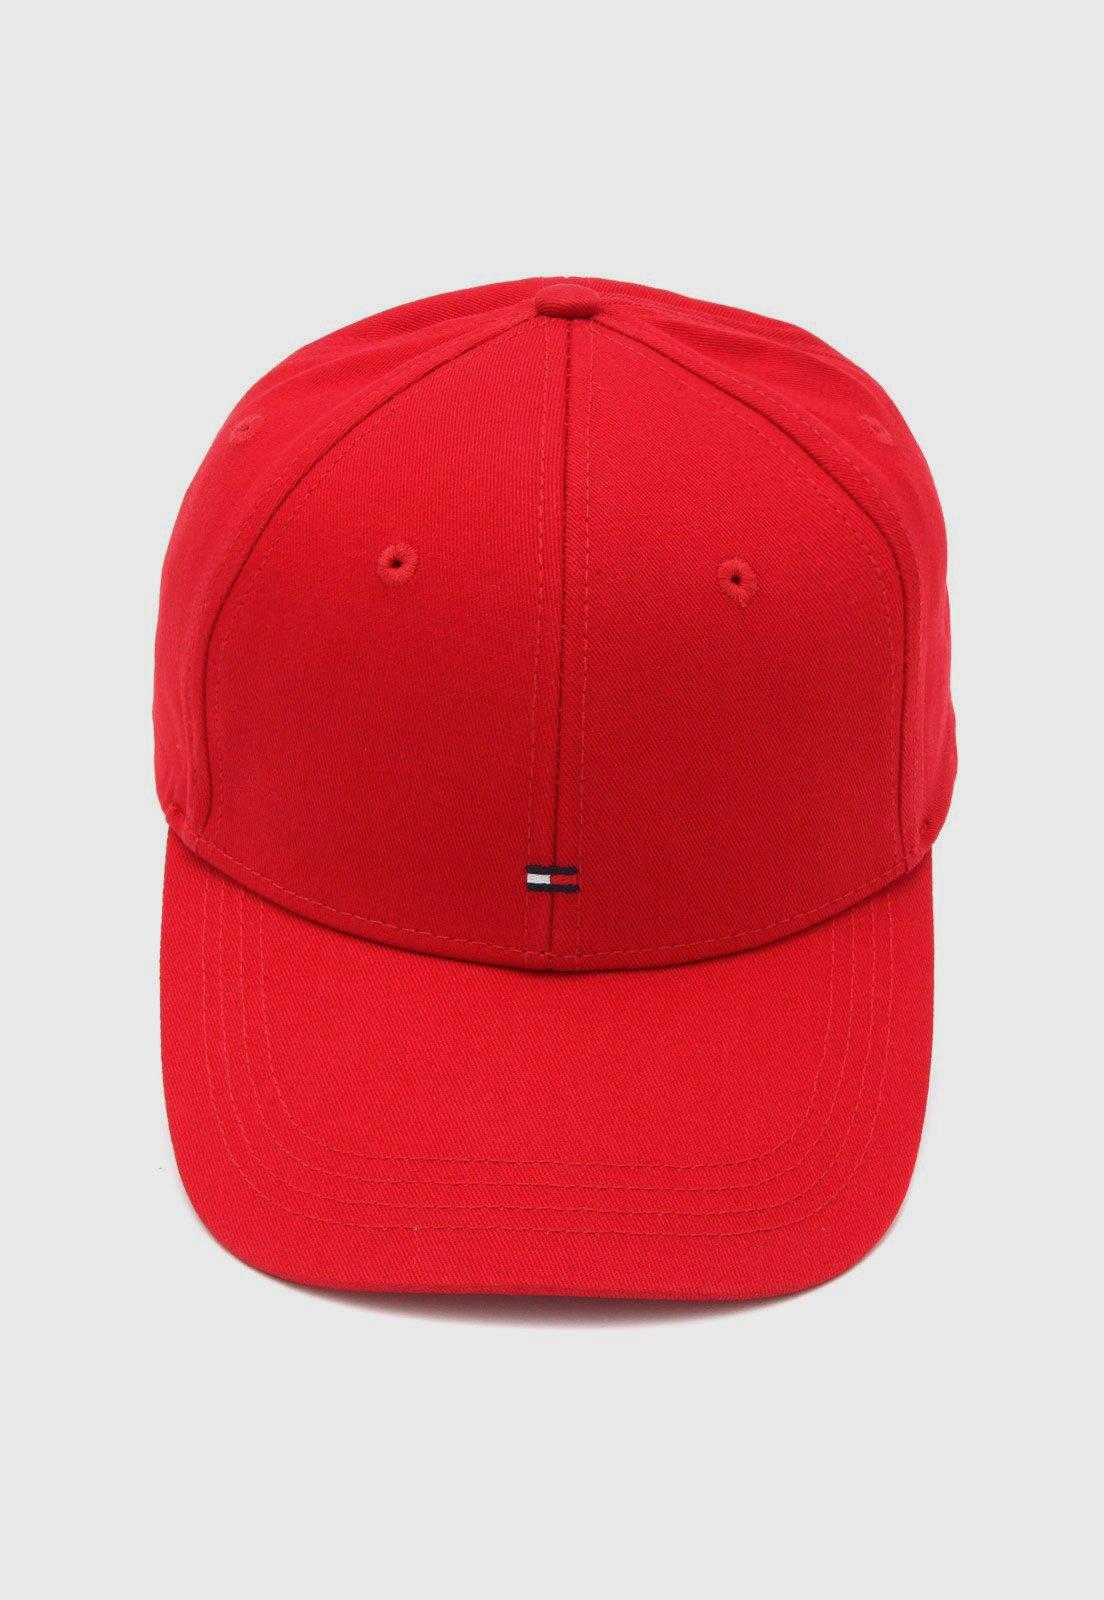 new collection online retailer sale usa online Boné Tommy Hilfiger Logo Vermelho